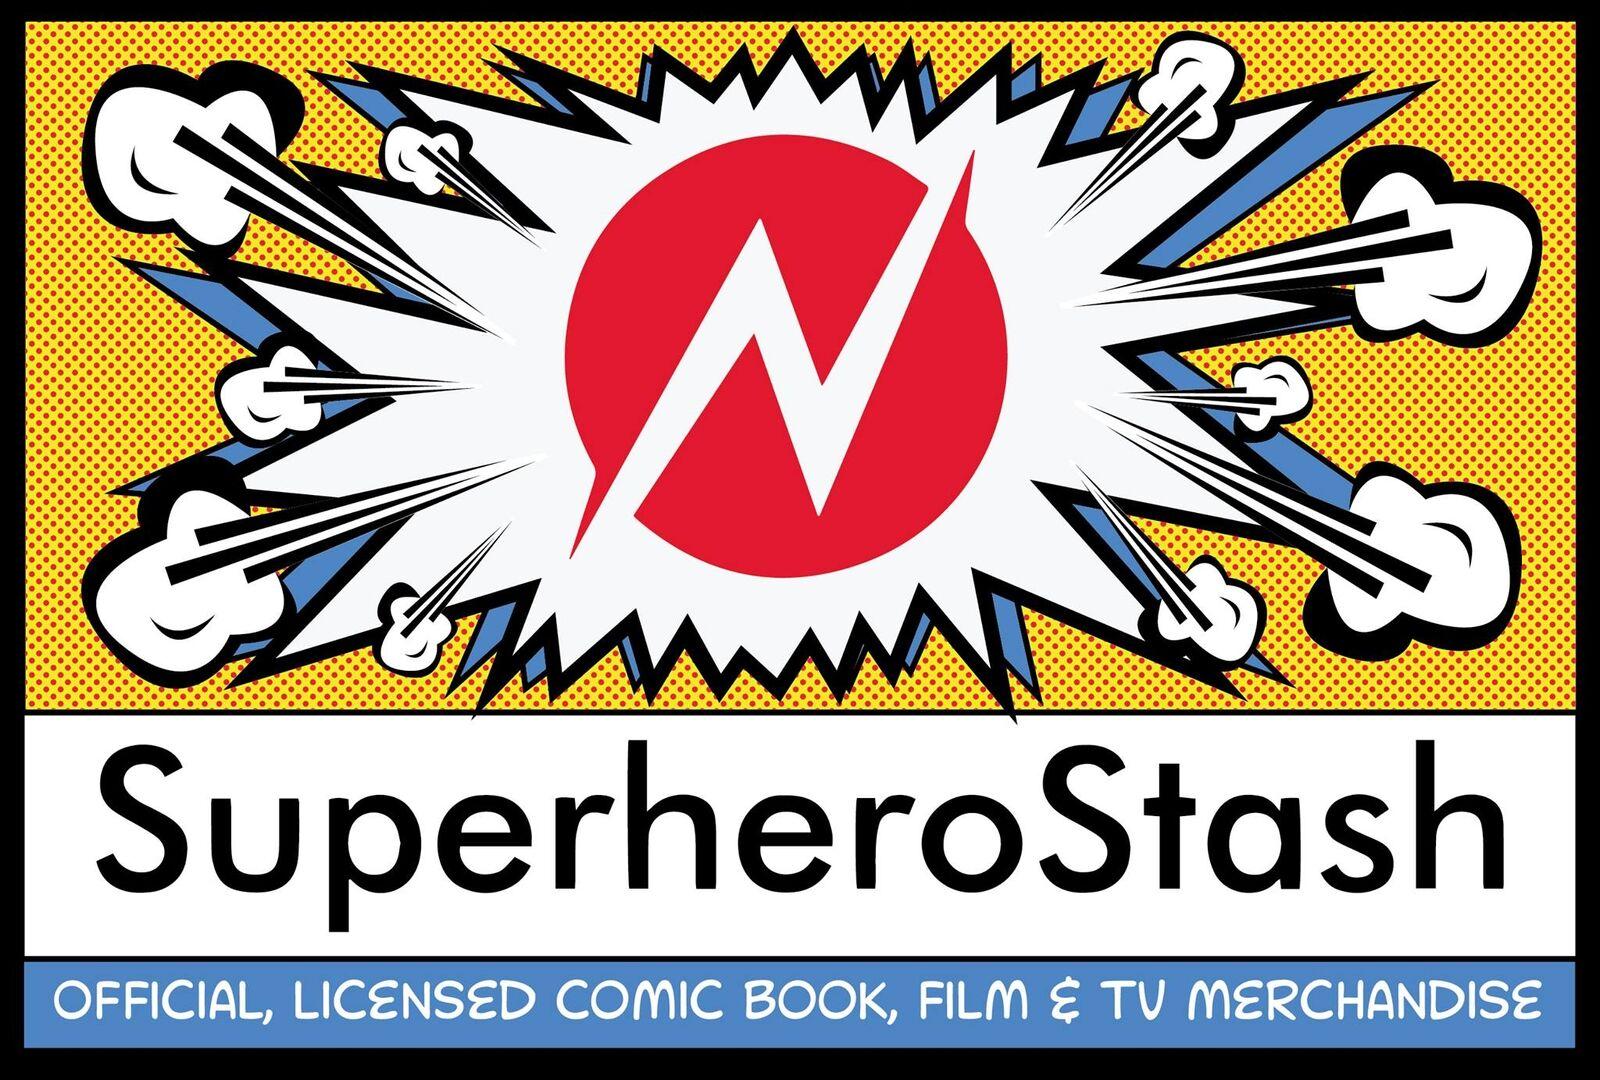 Superherostash